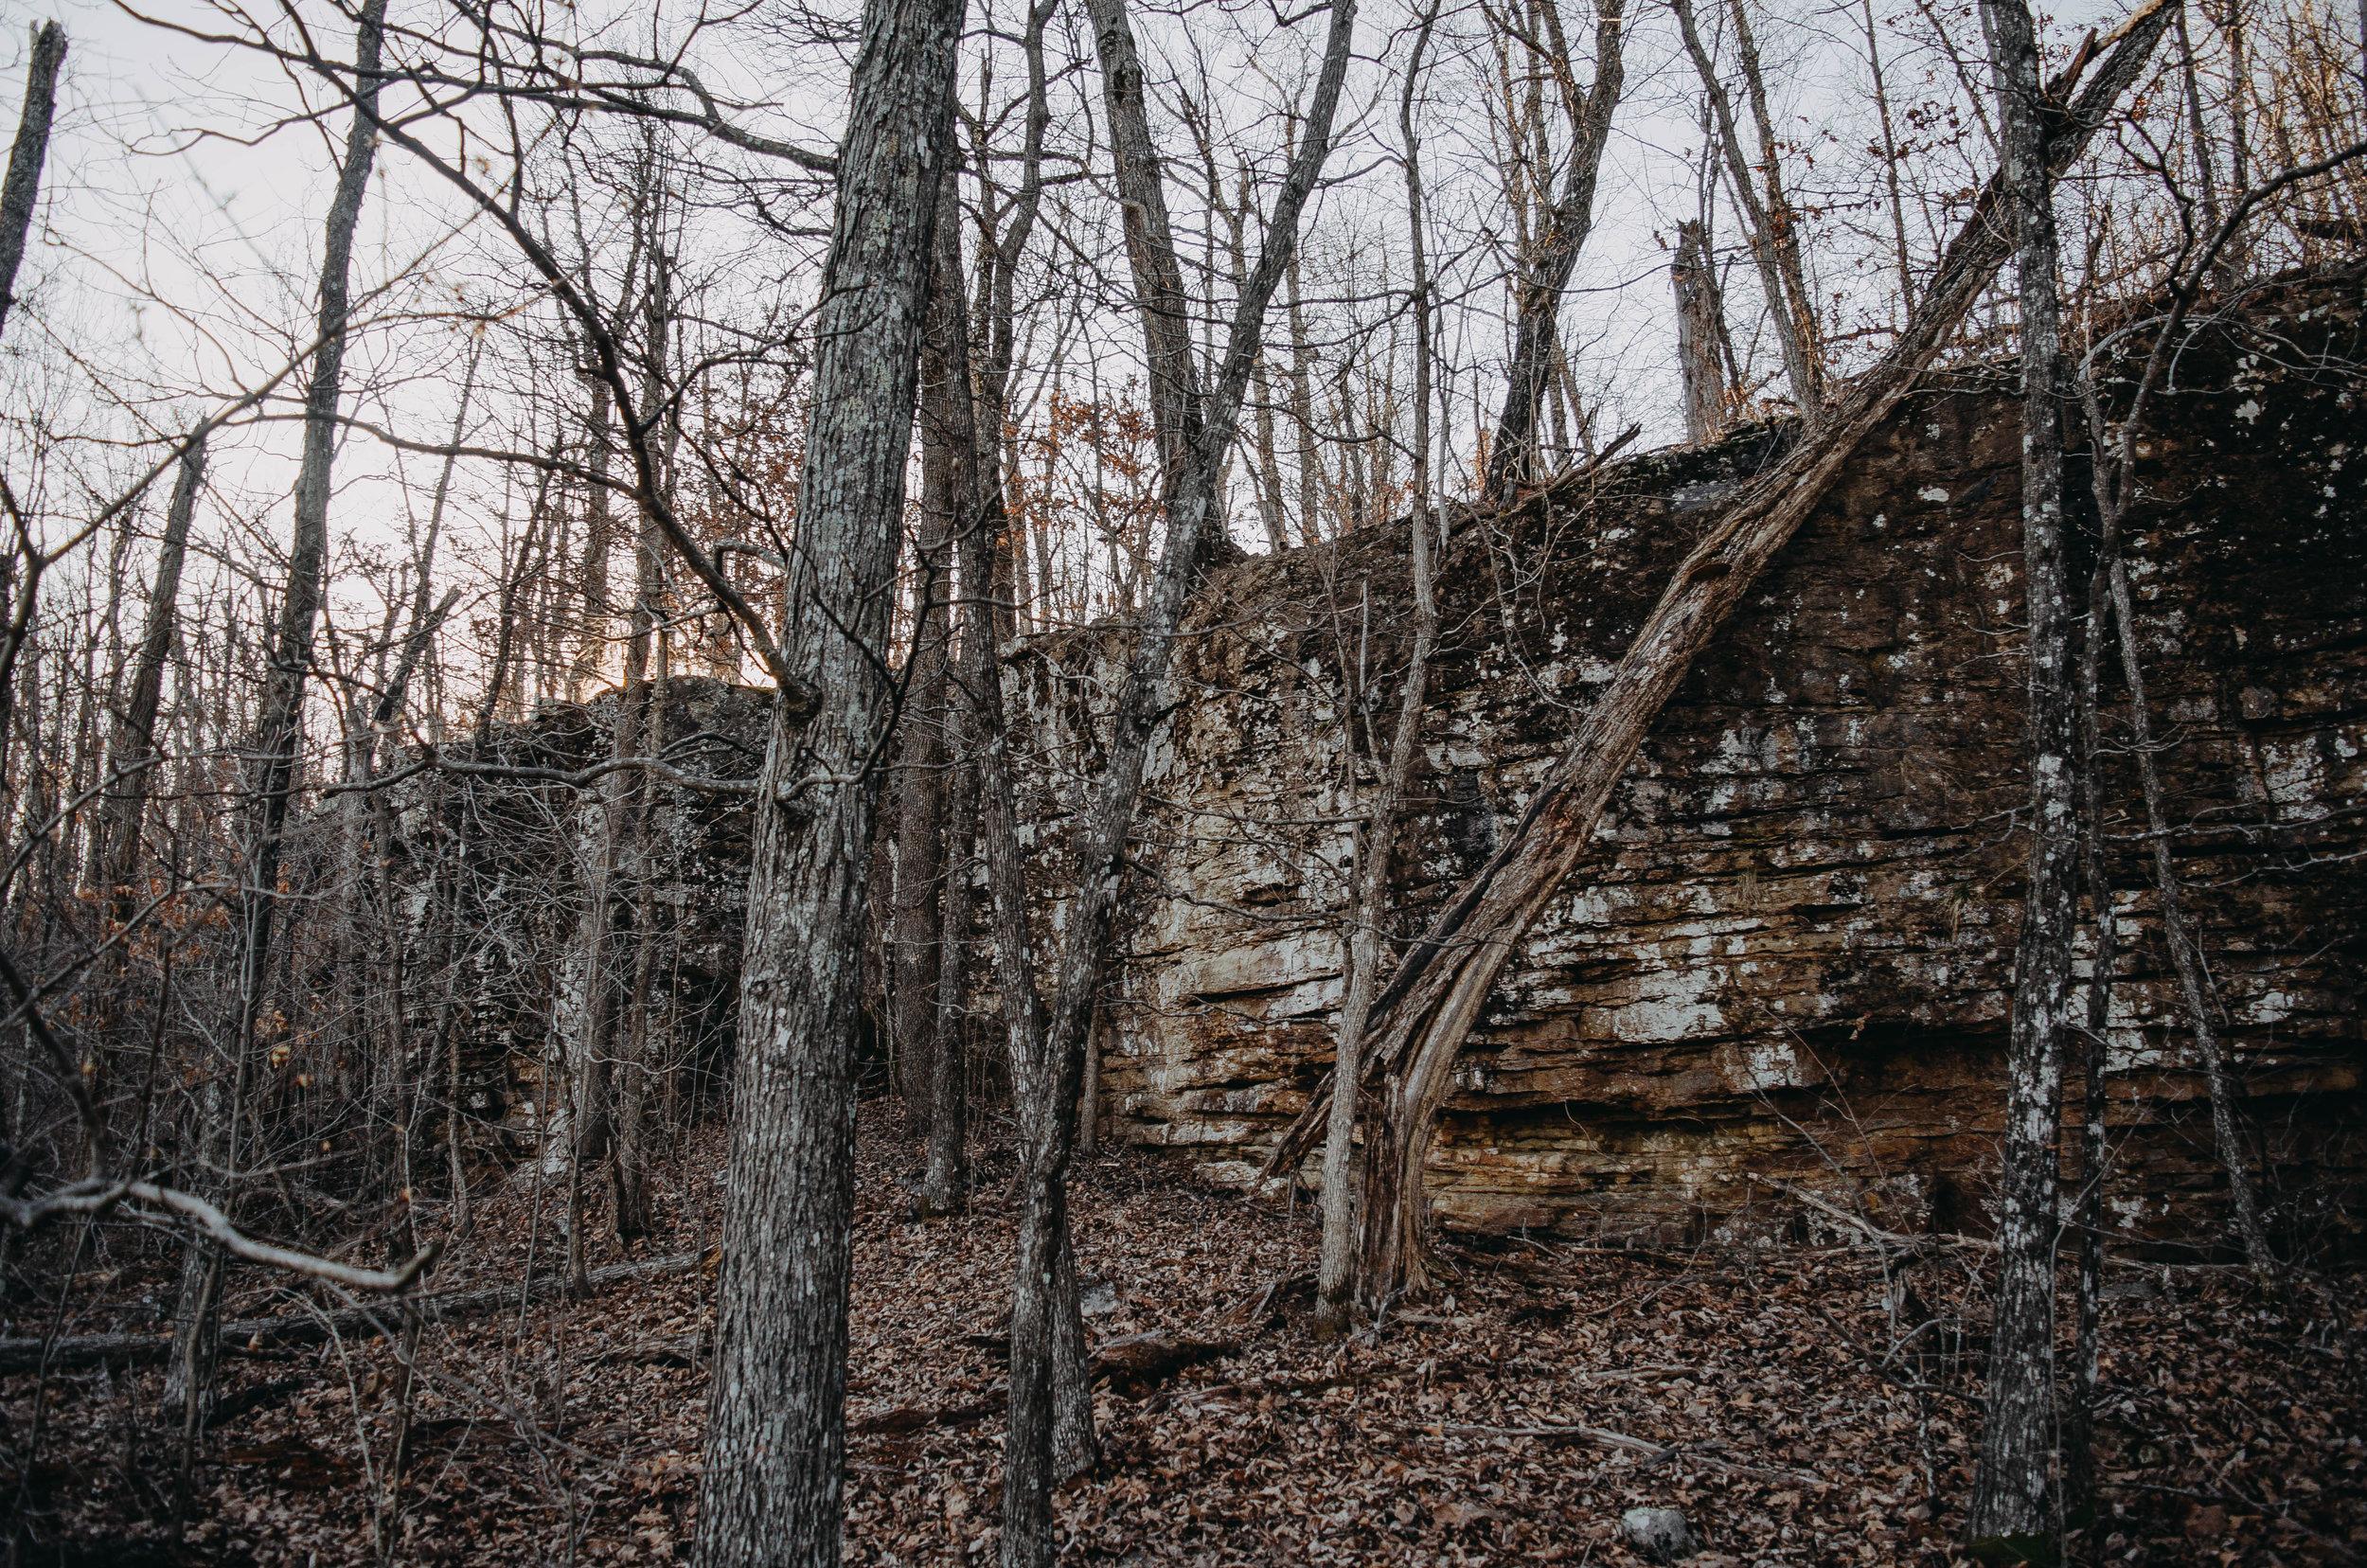 The path follows eastward along the small cap-rock bluff